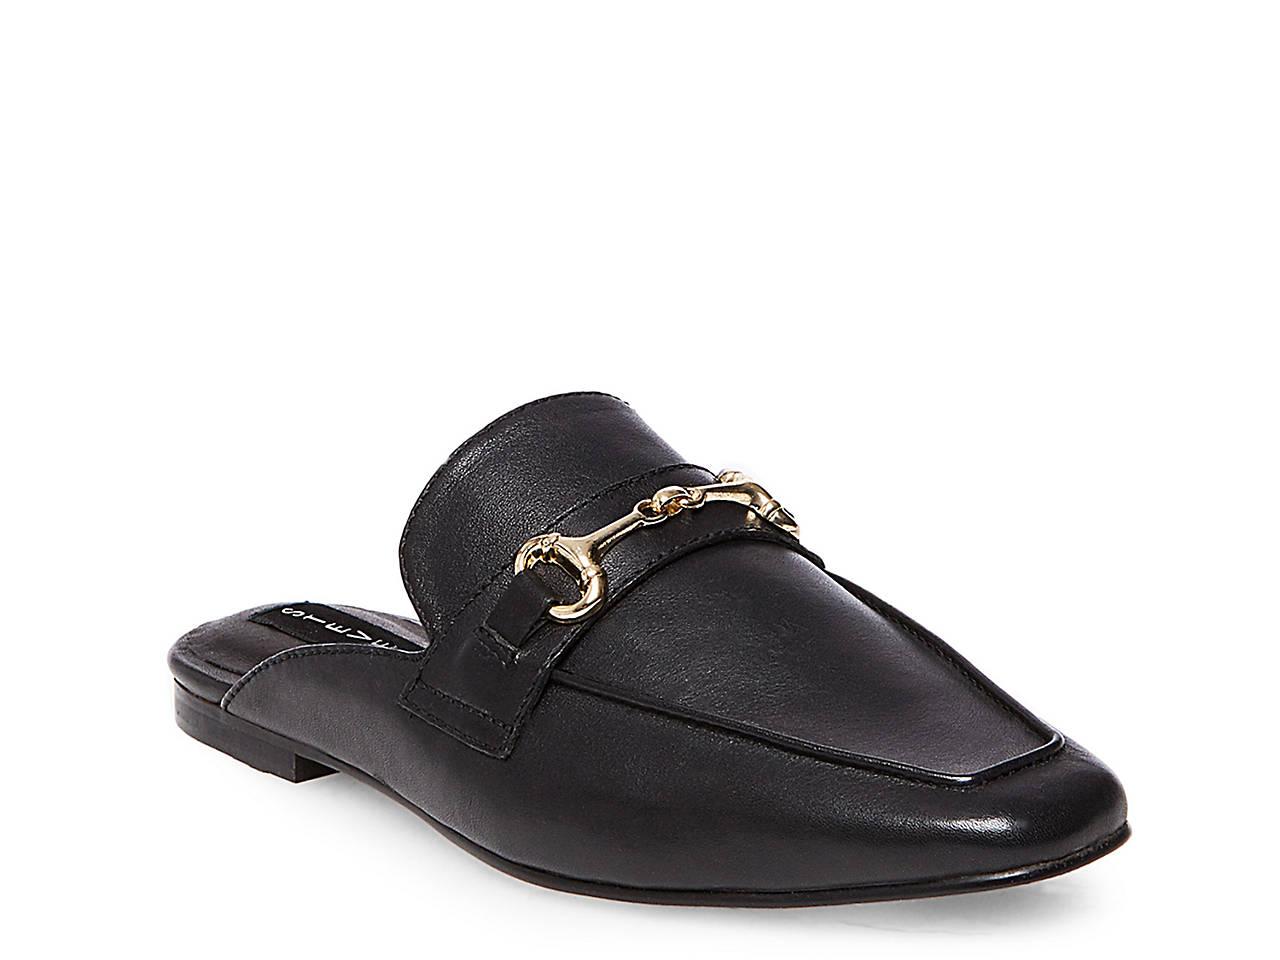 814f1af596d Steven by Steve Madden Razzi-L Mule Women s Shoes